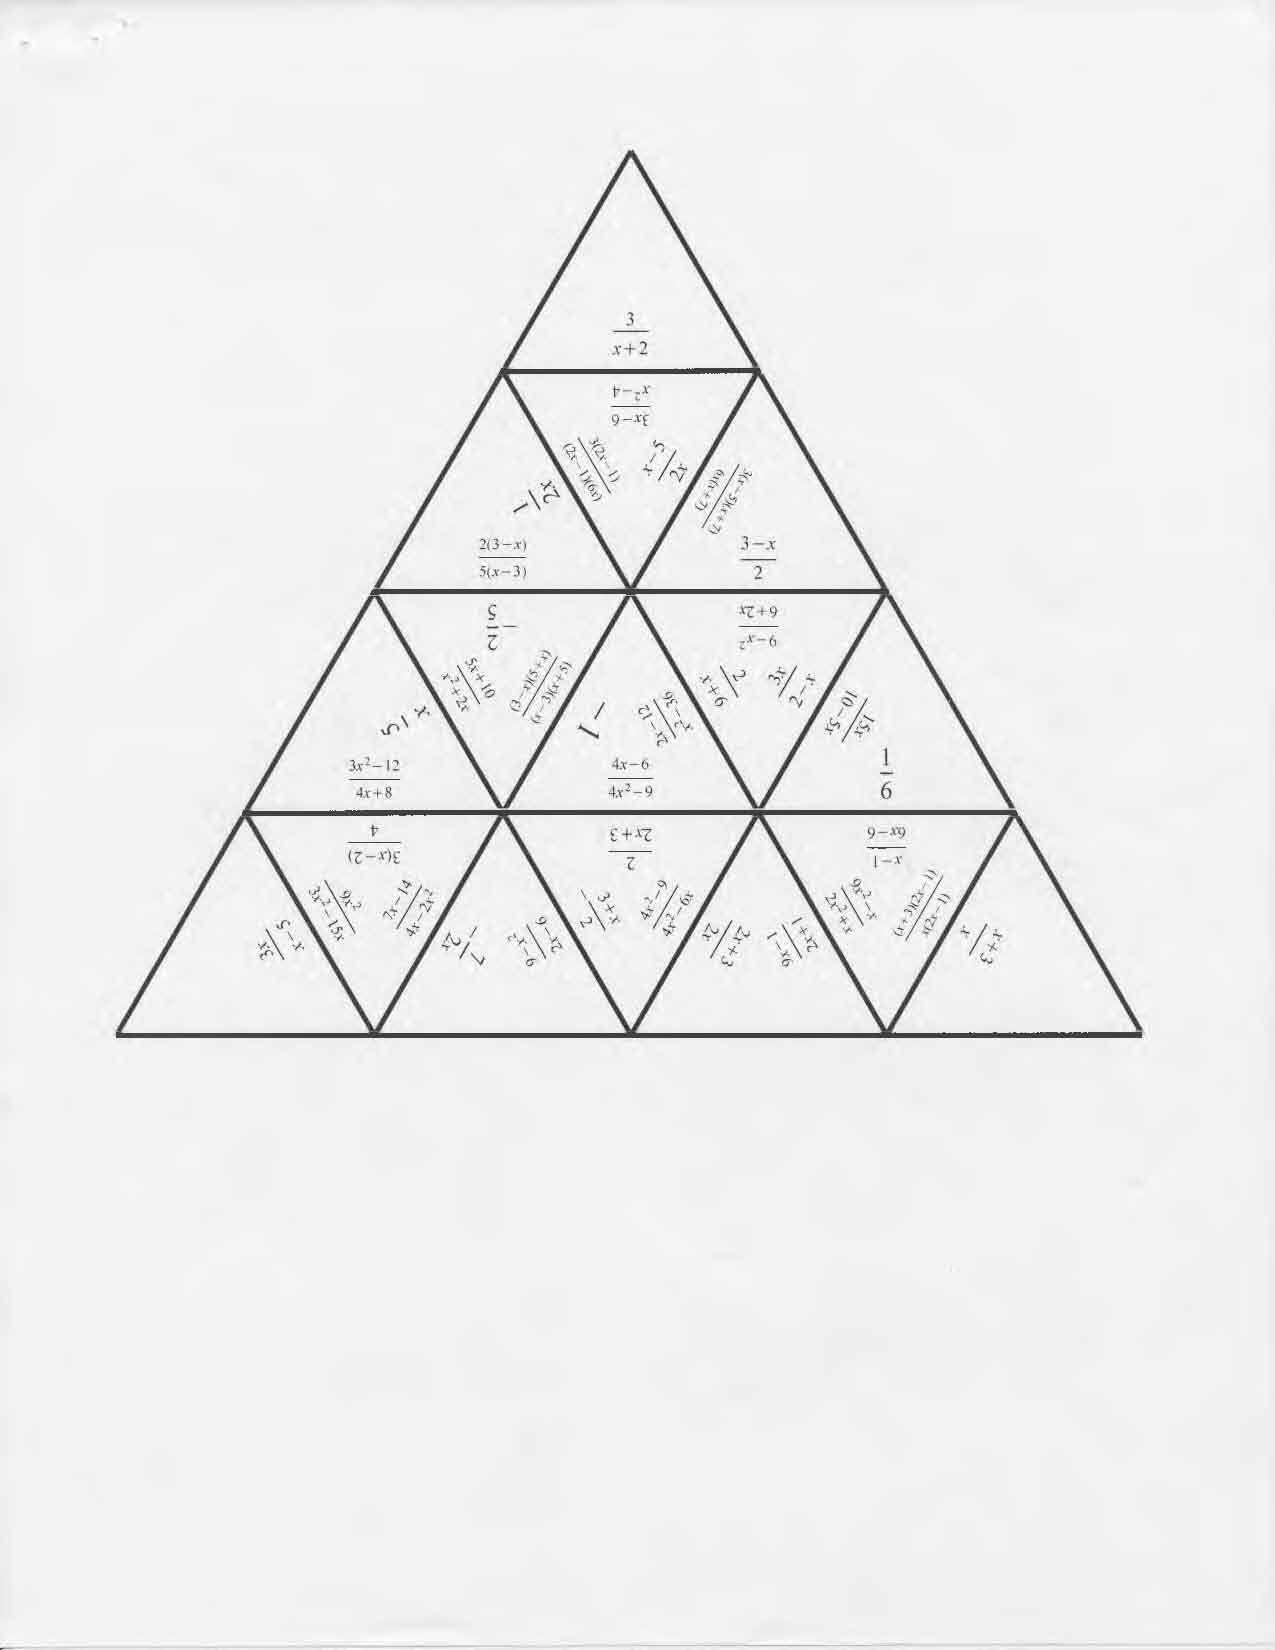 Tarsia Puzzle Simplify Rational Expressions   Algebra   Simplifying - Printable Tarsia Puzzles English